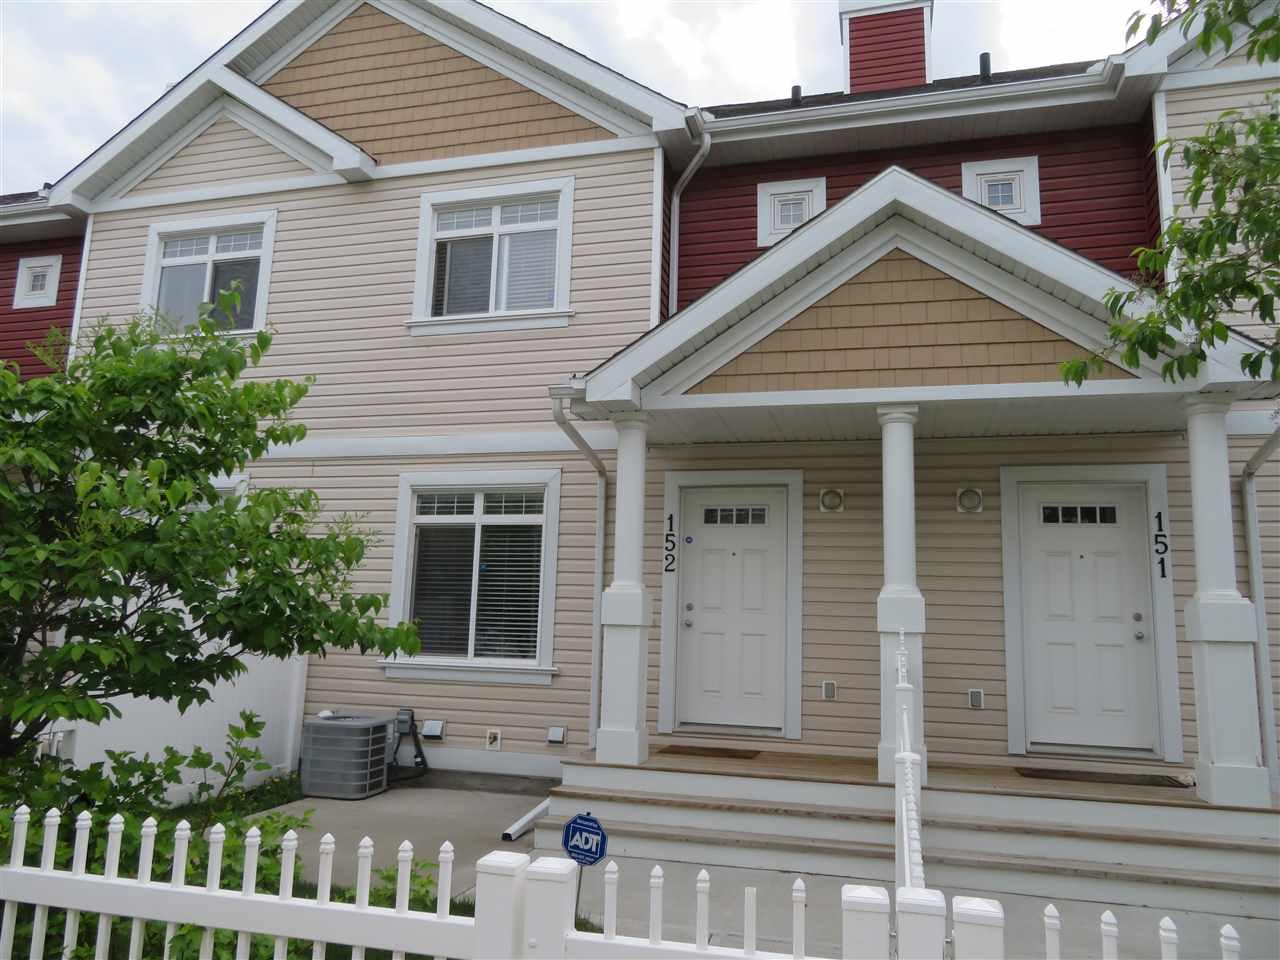 152 1804 70 Street, 3 bed, 2.1 bath, at $267,900